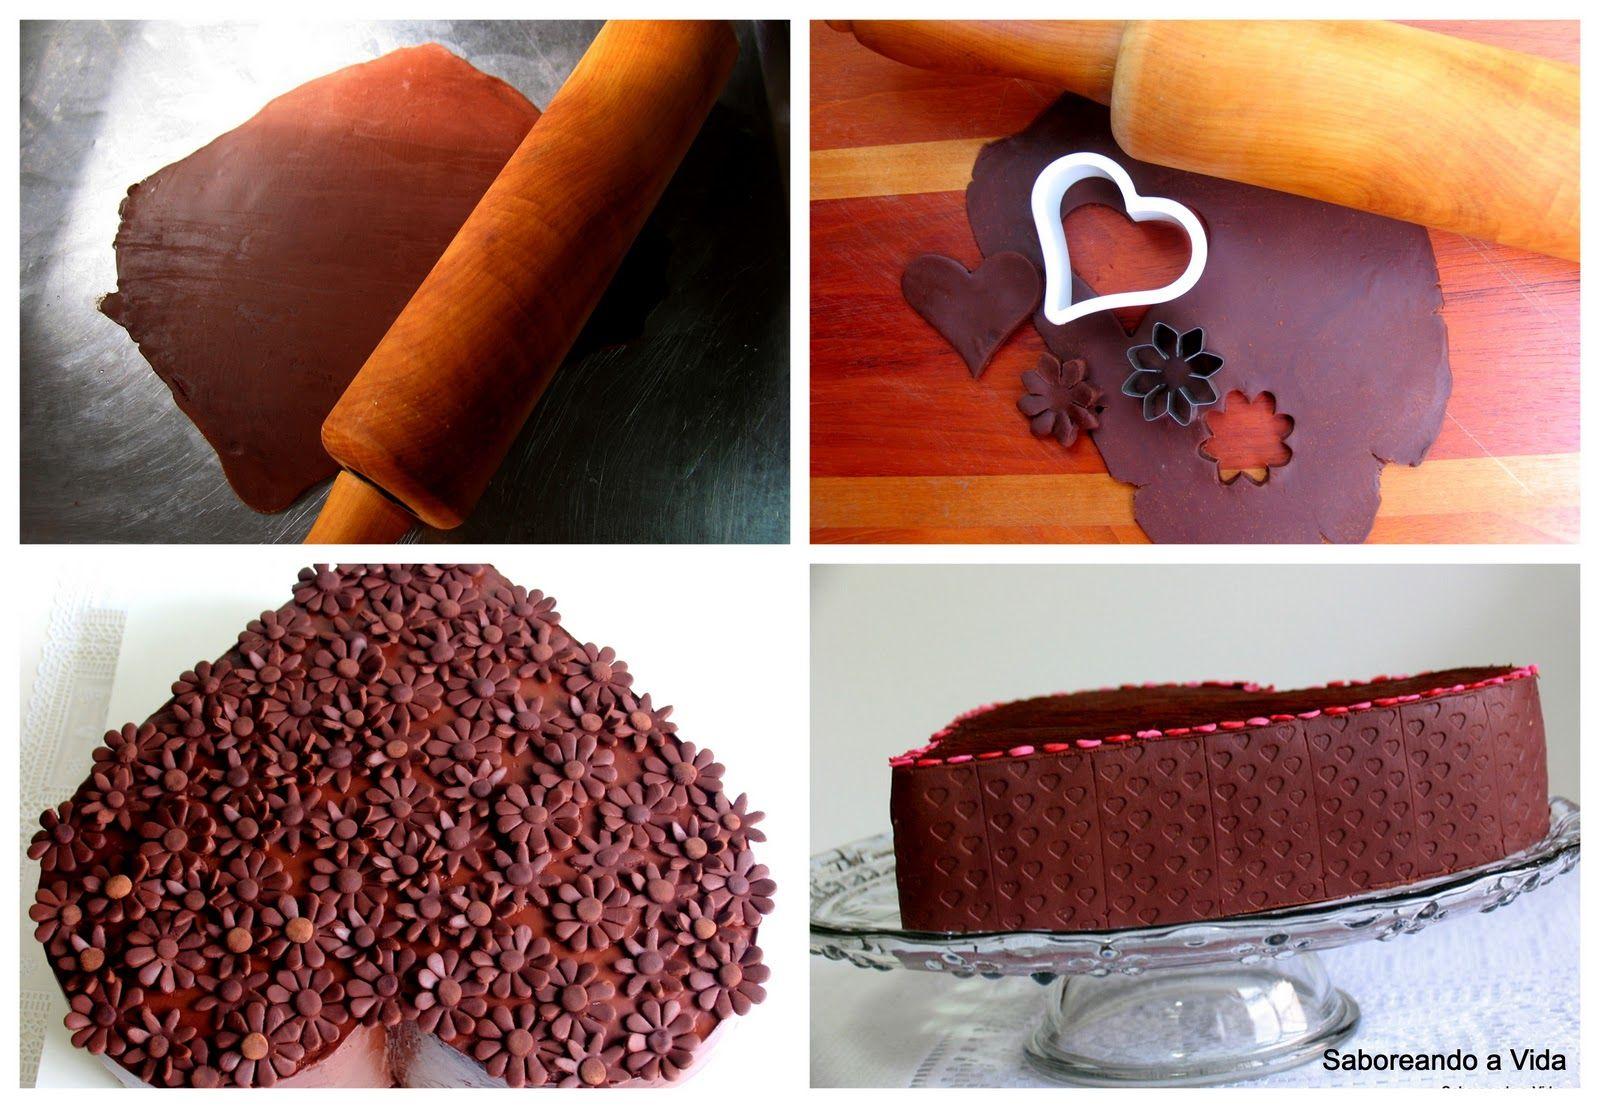 saboreando a vida: Pasta de Chocolate Fantástica - e Esclarecimentos